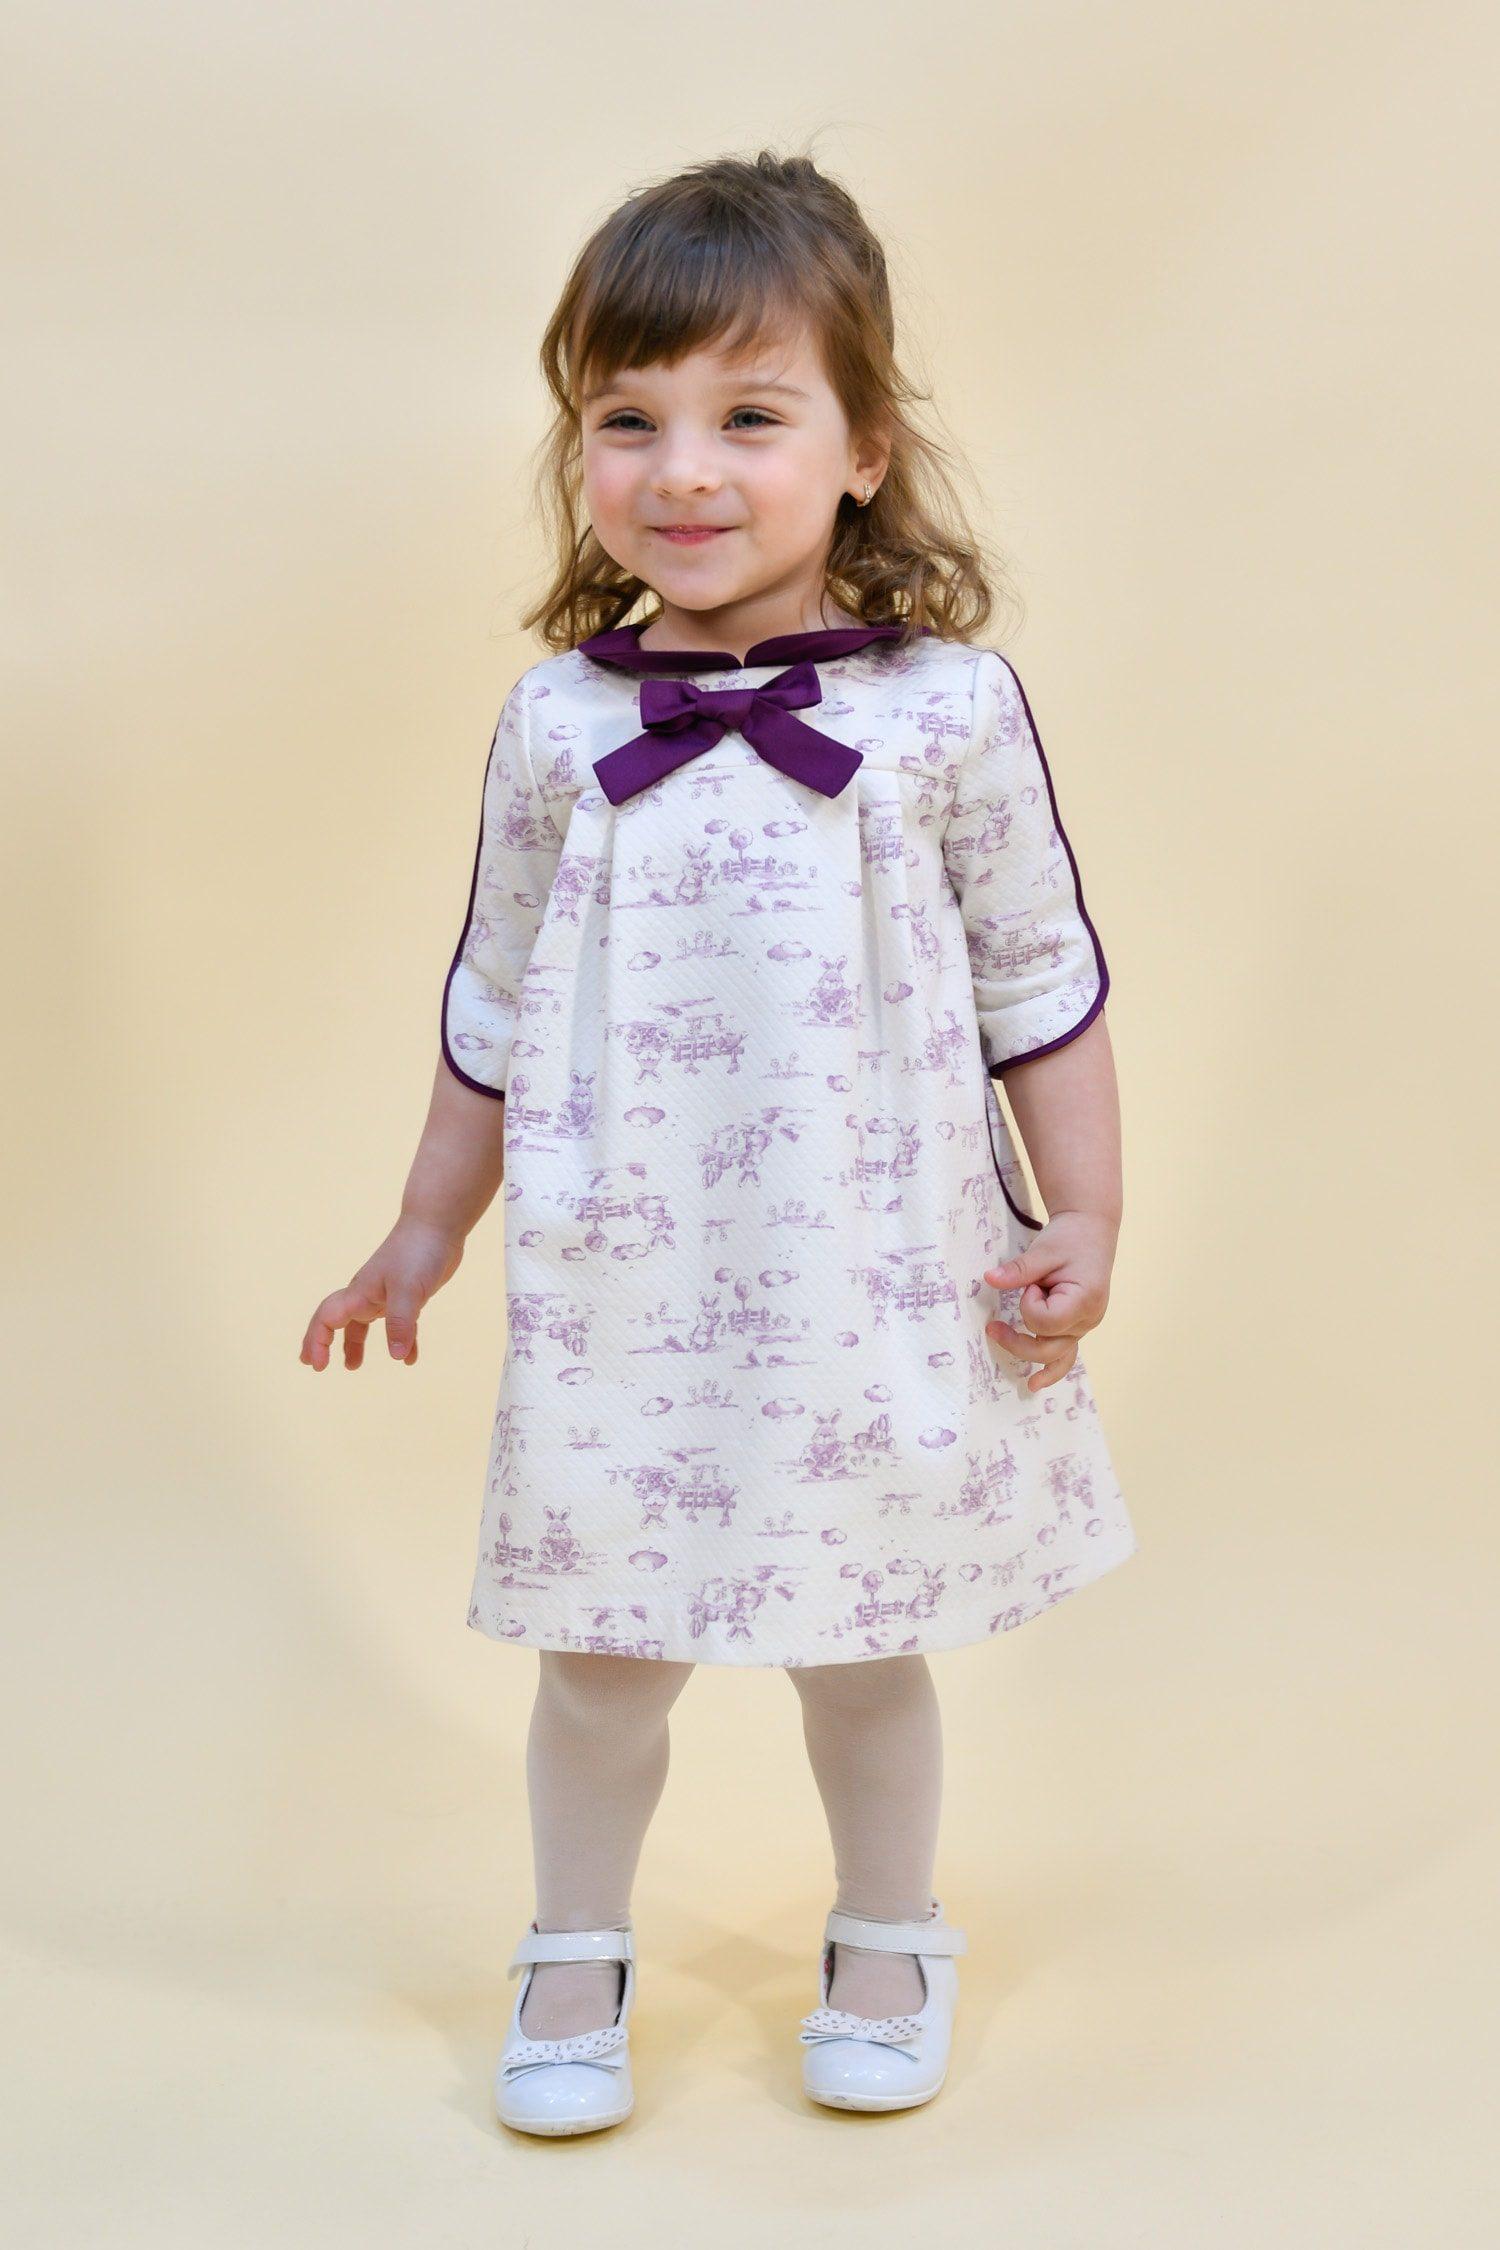 Rochie pentru fetițe Alice in Wonderland